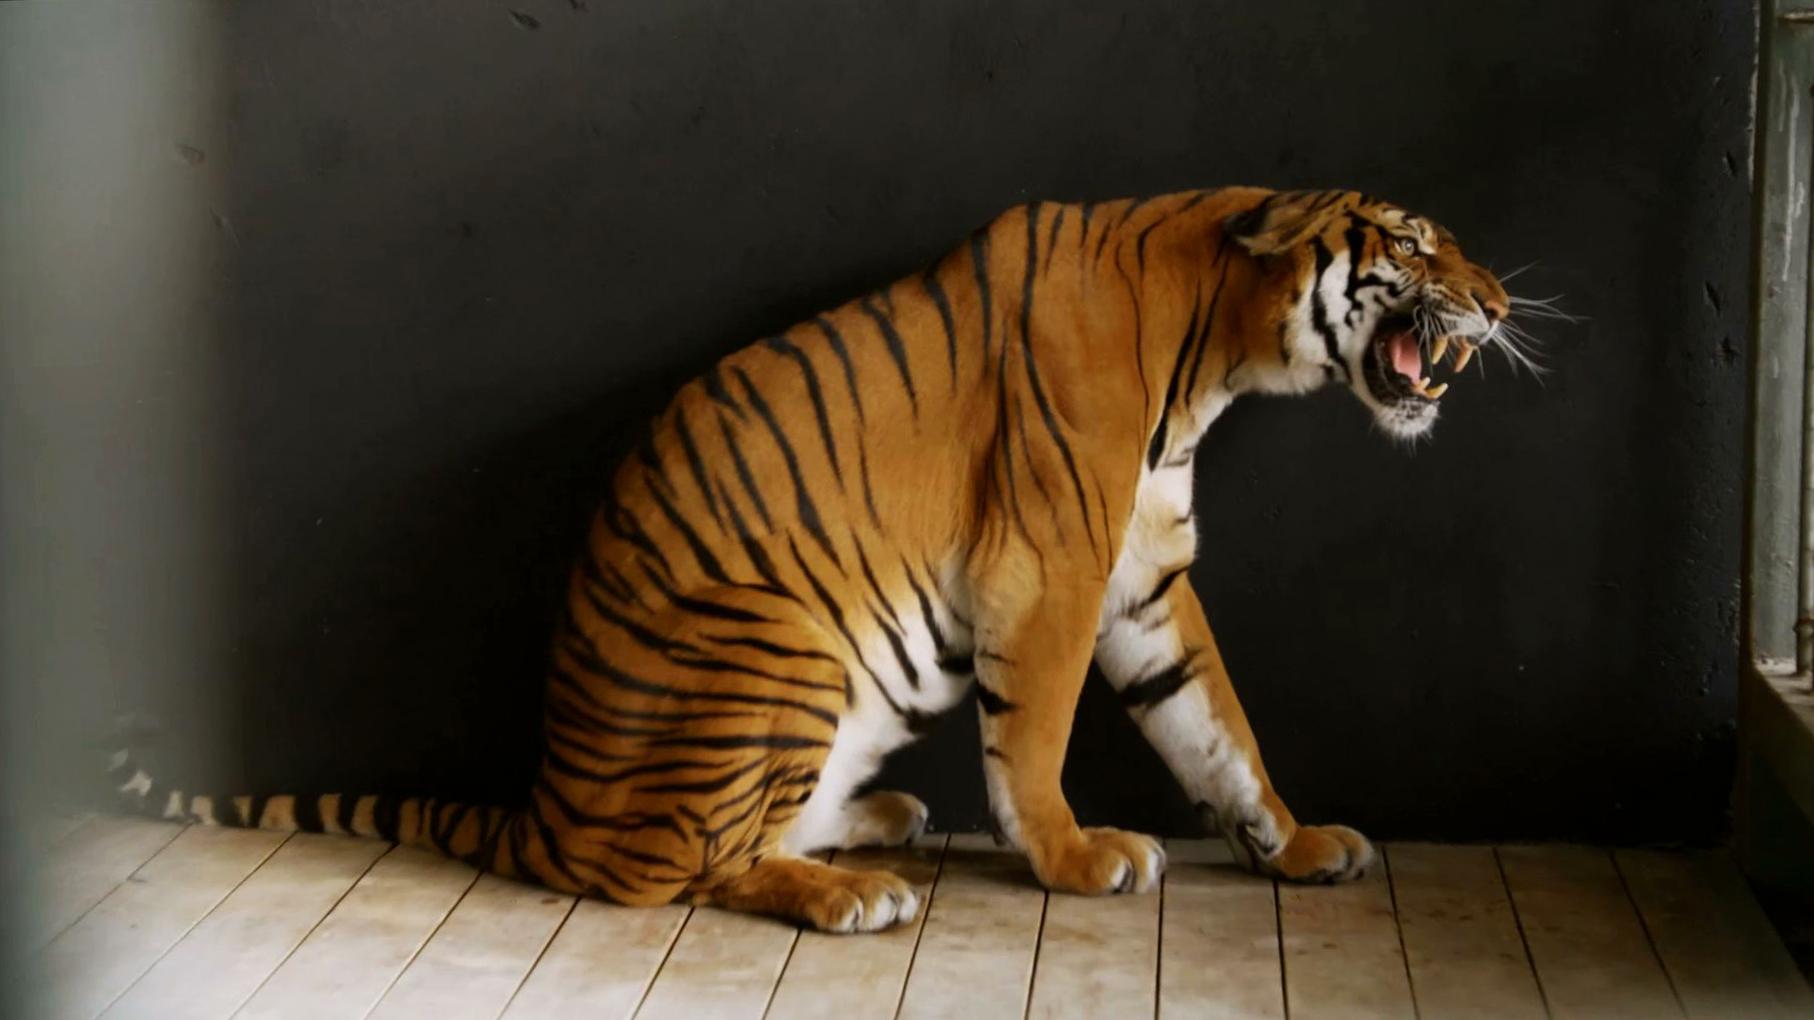 Lighting the South China Tiger